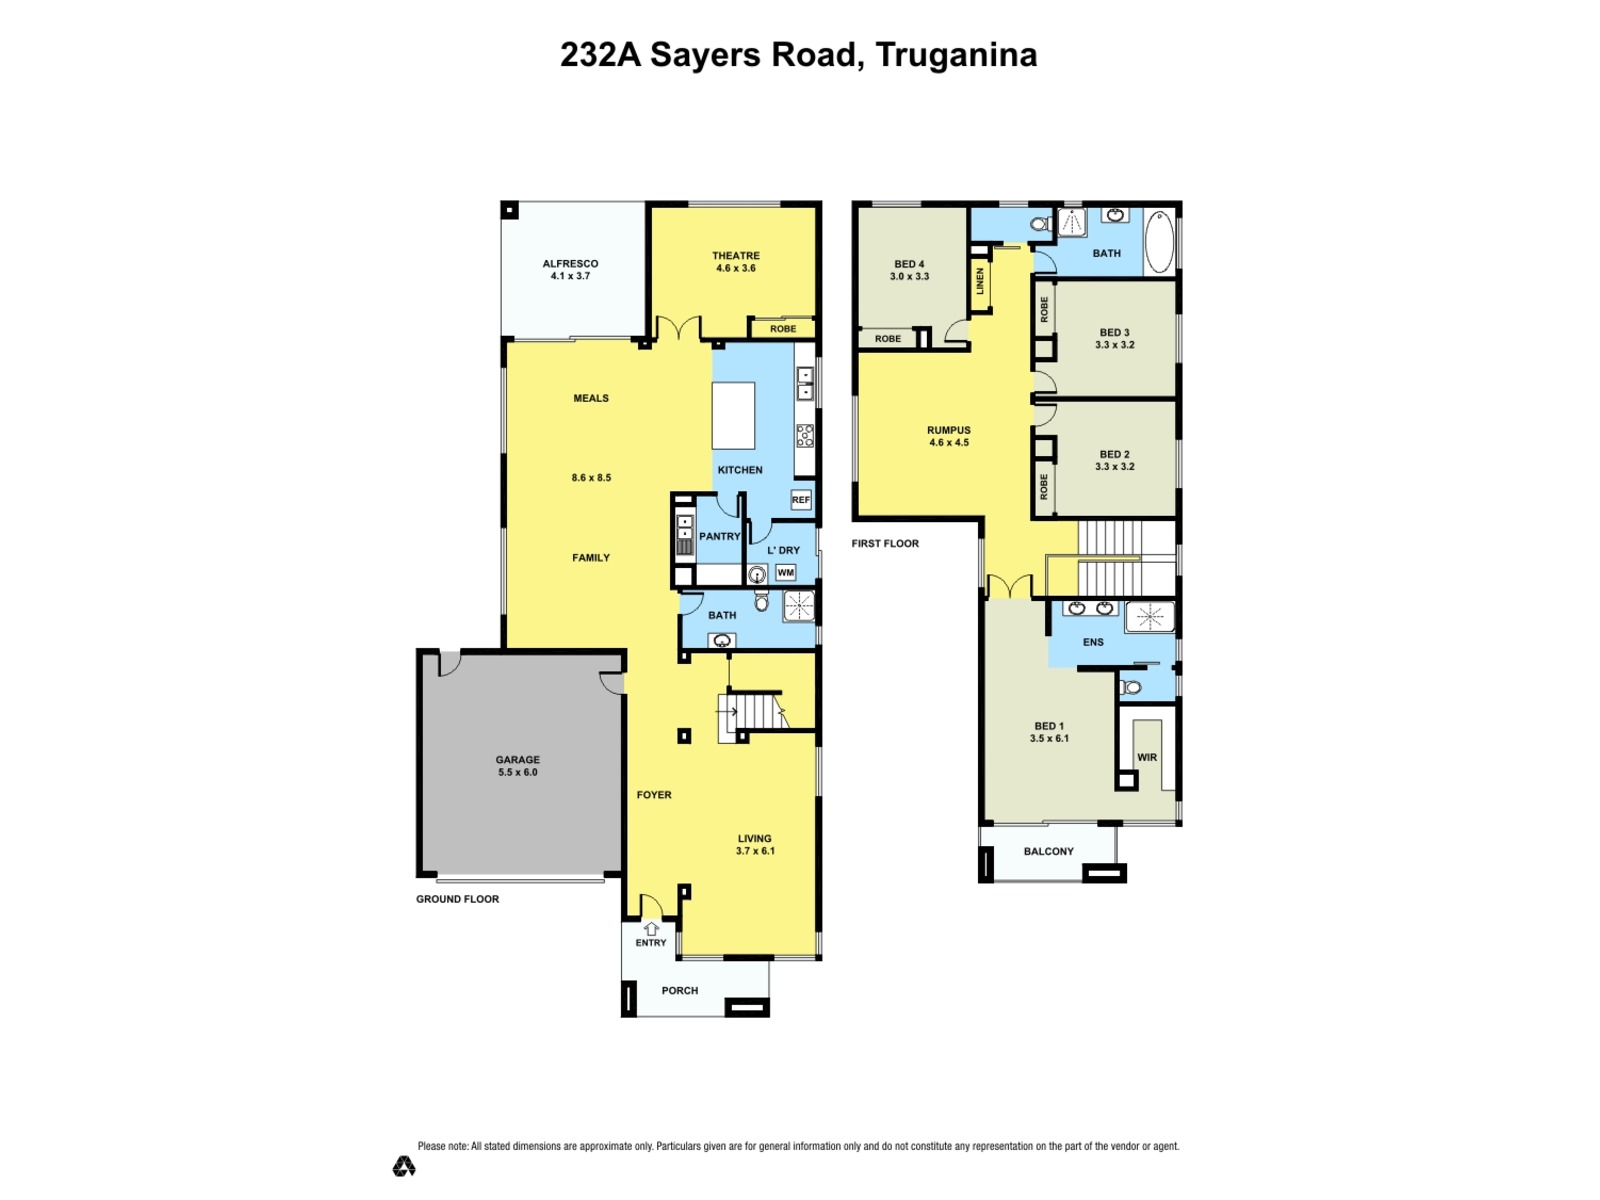 232A Sayers Road, Truganina